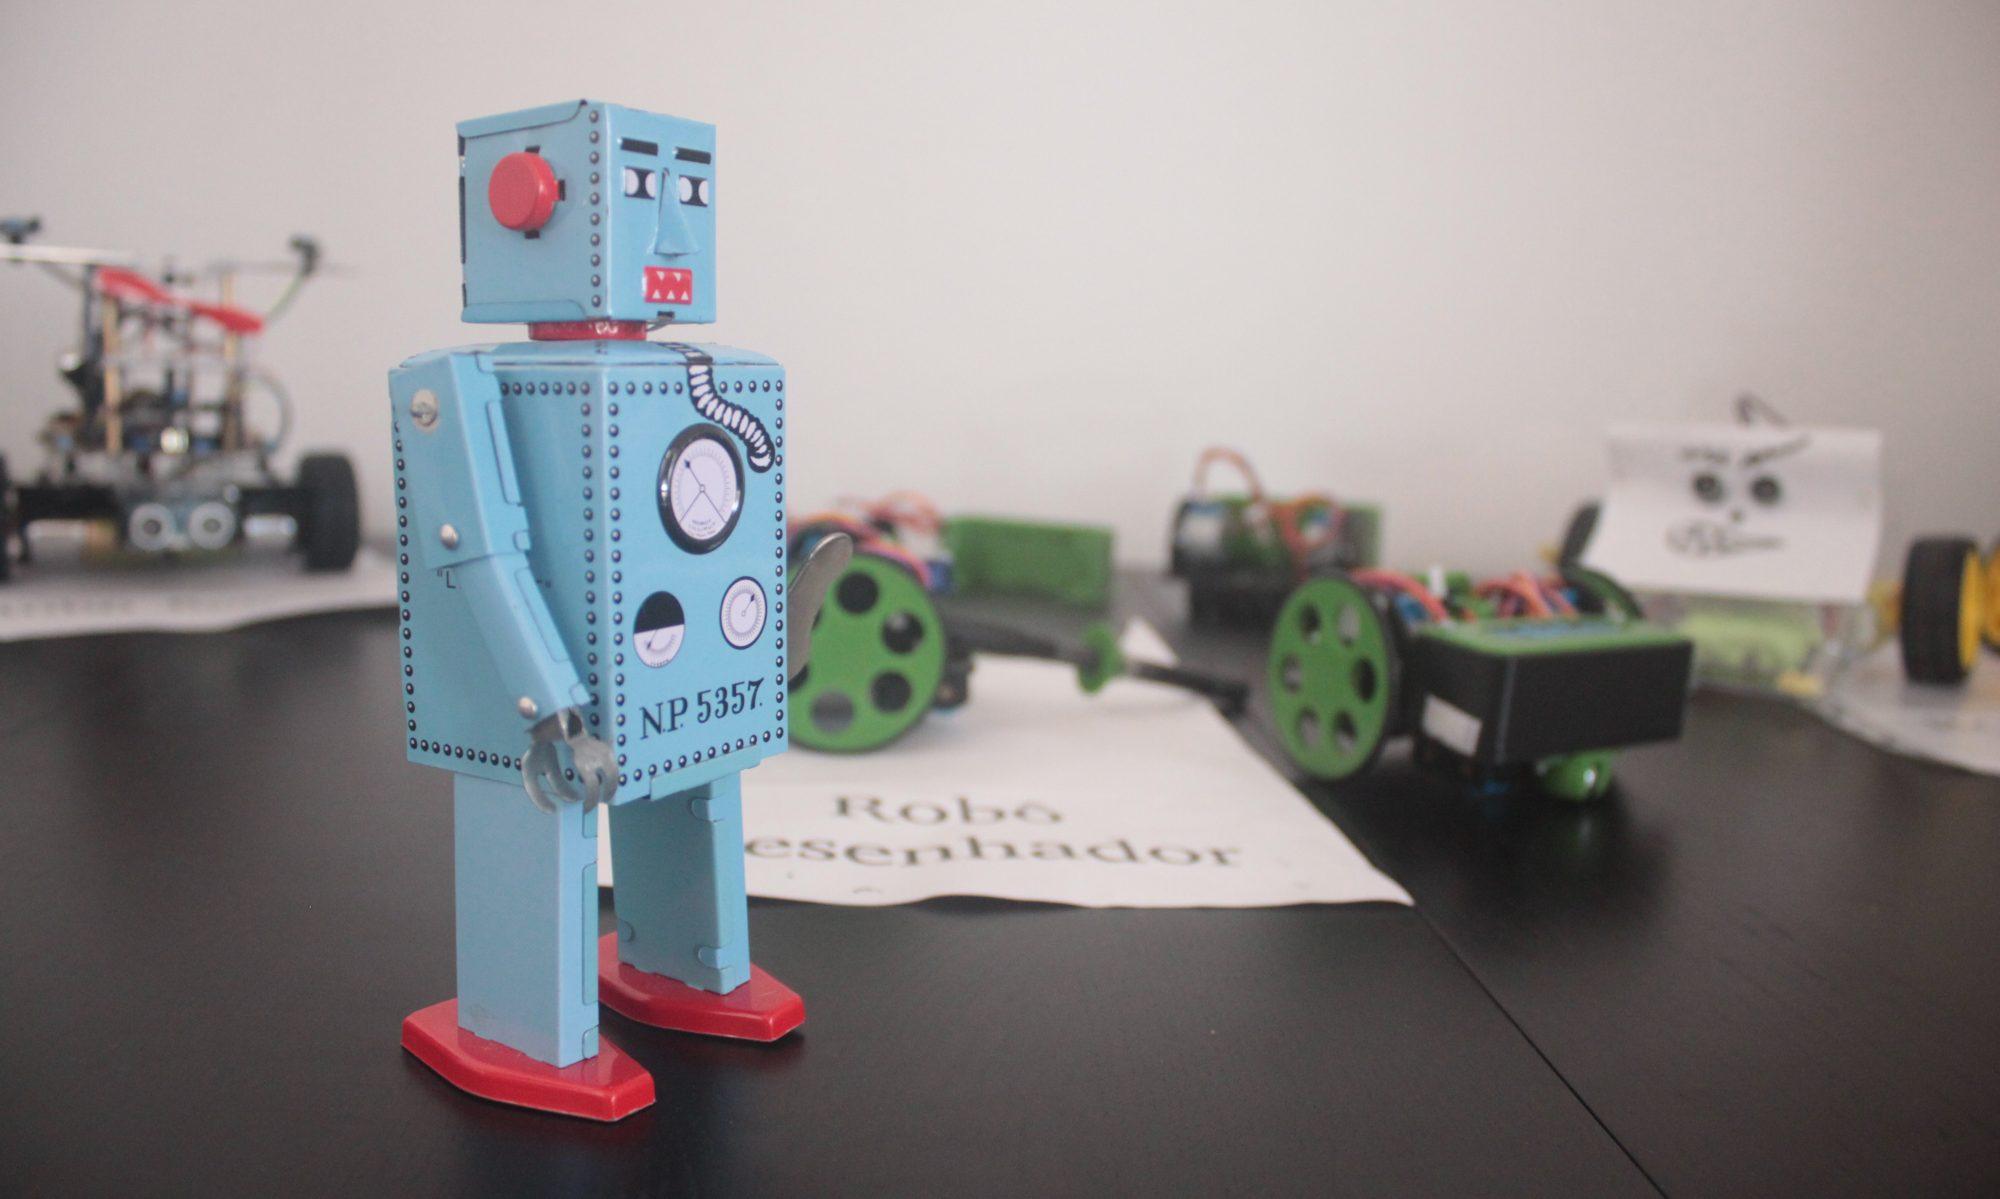 Clube de Robótica